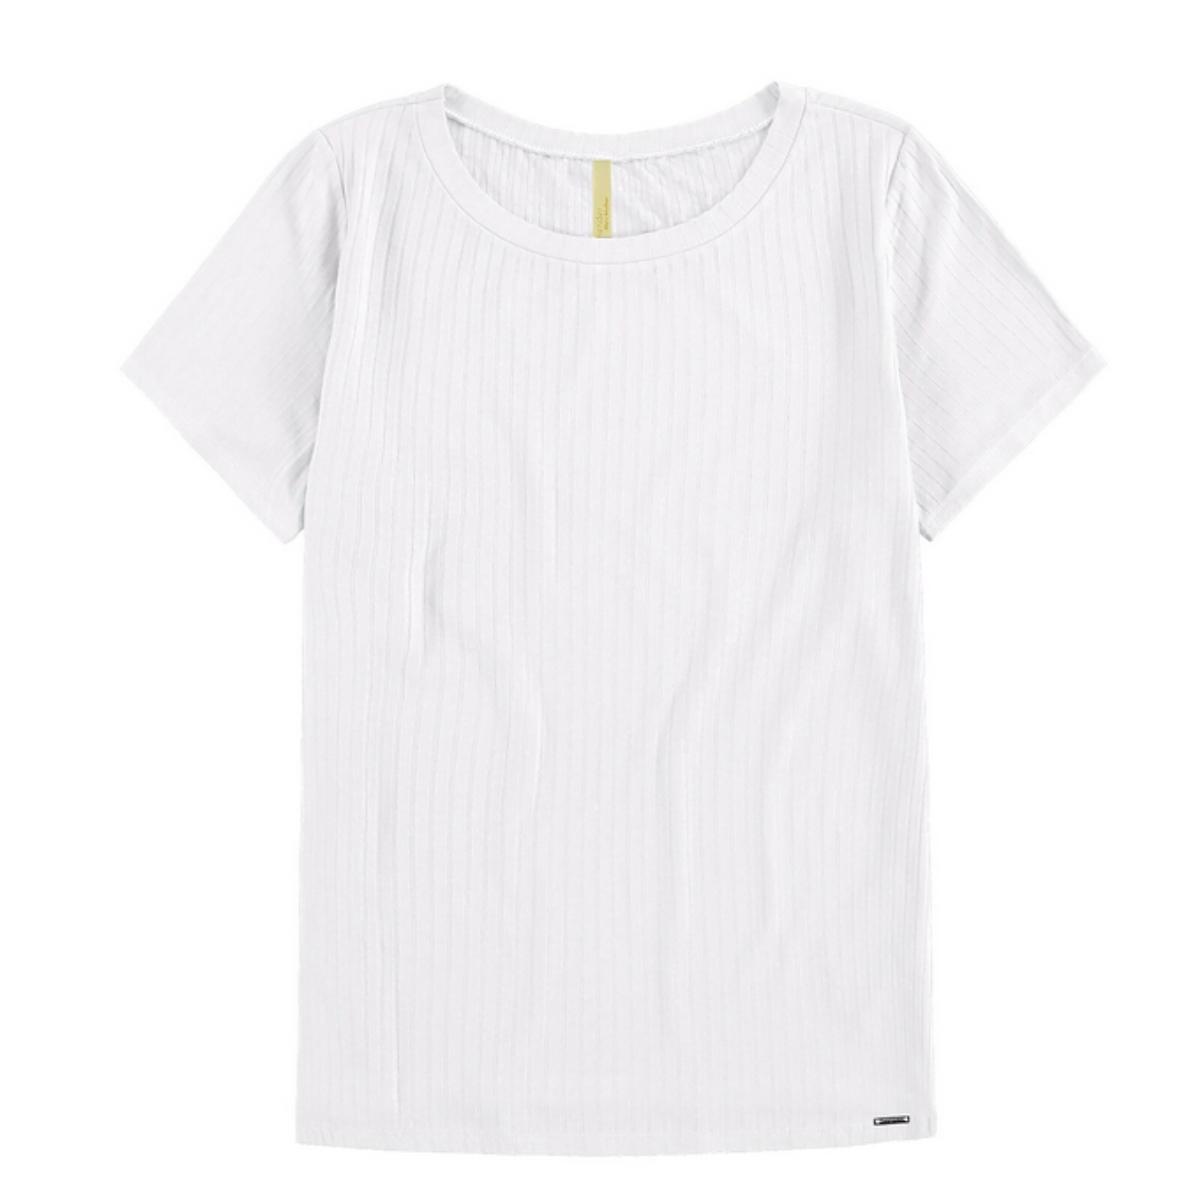 Blusa Feminina Lunender 00459 Branco